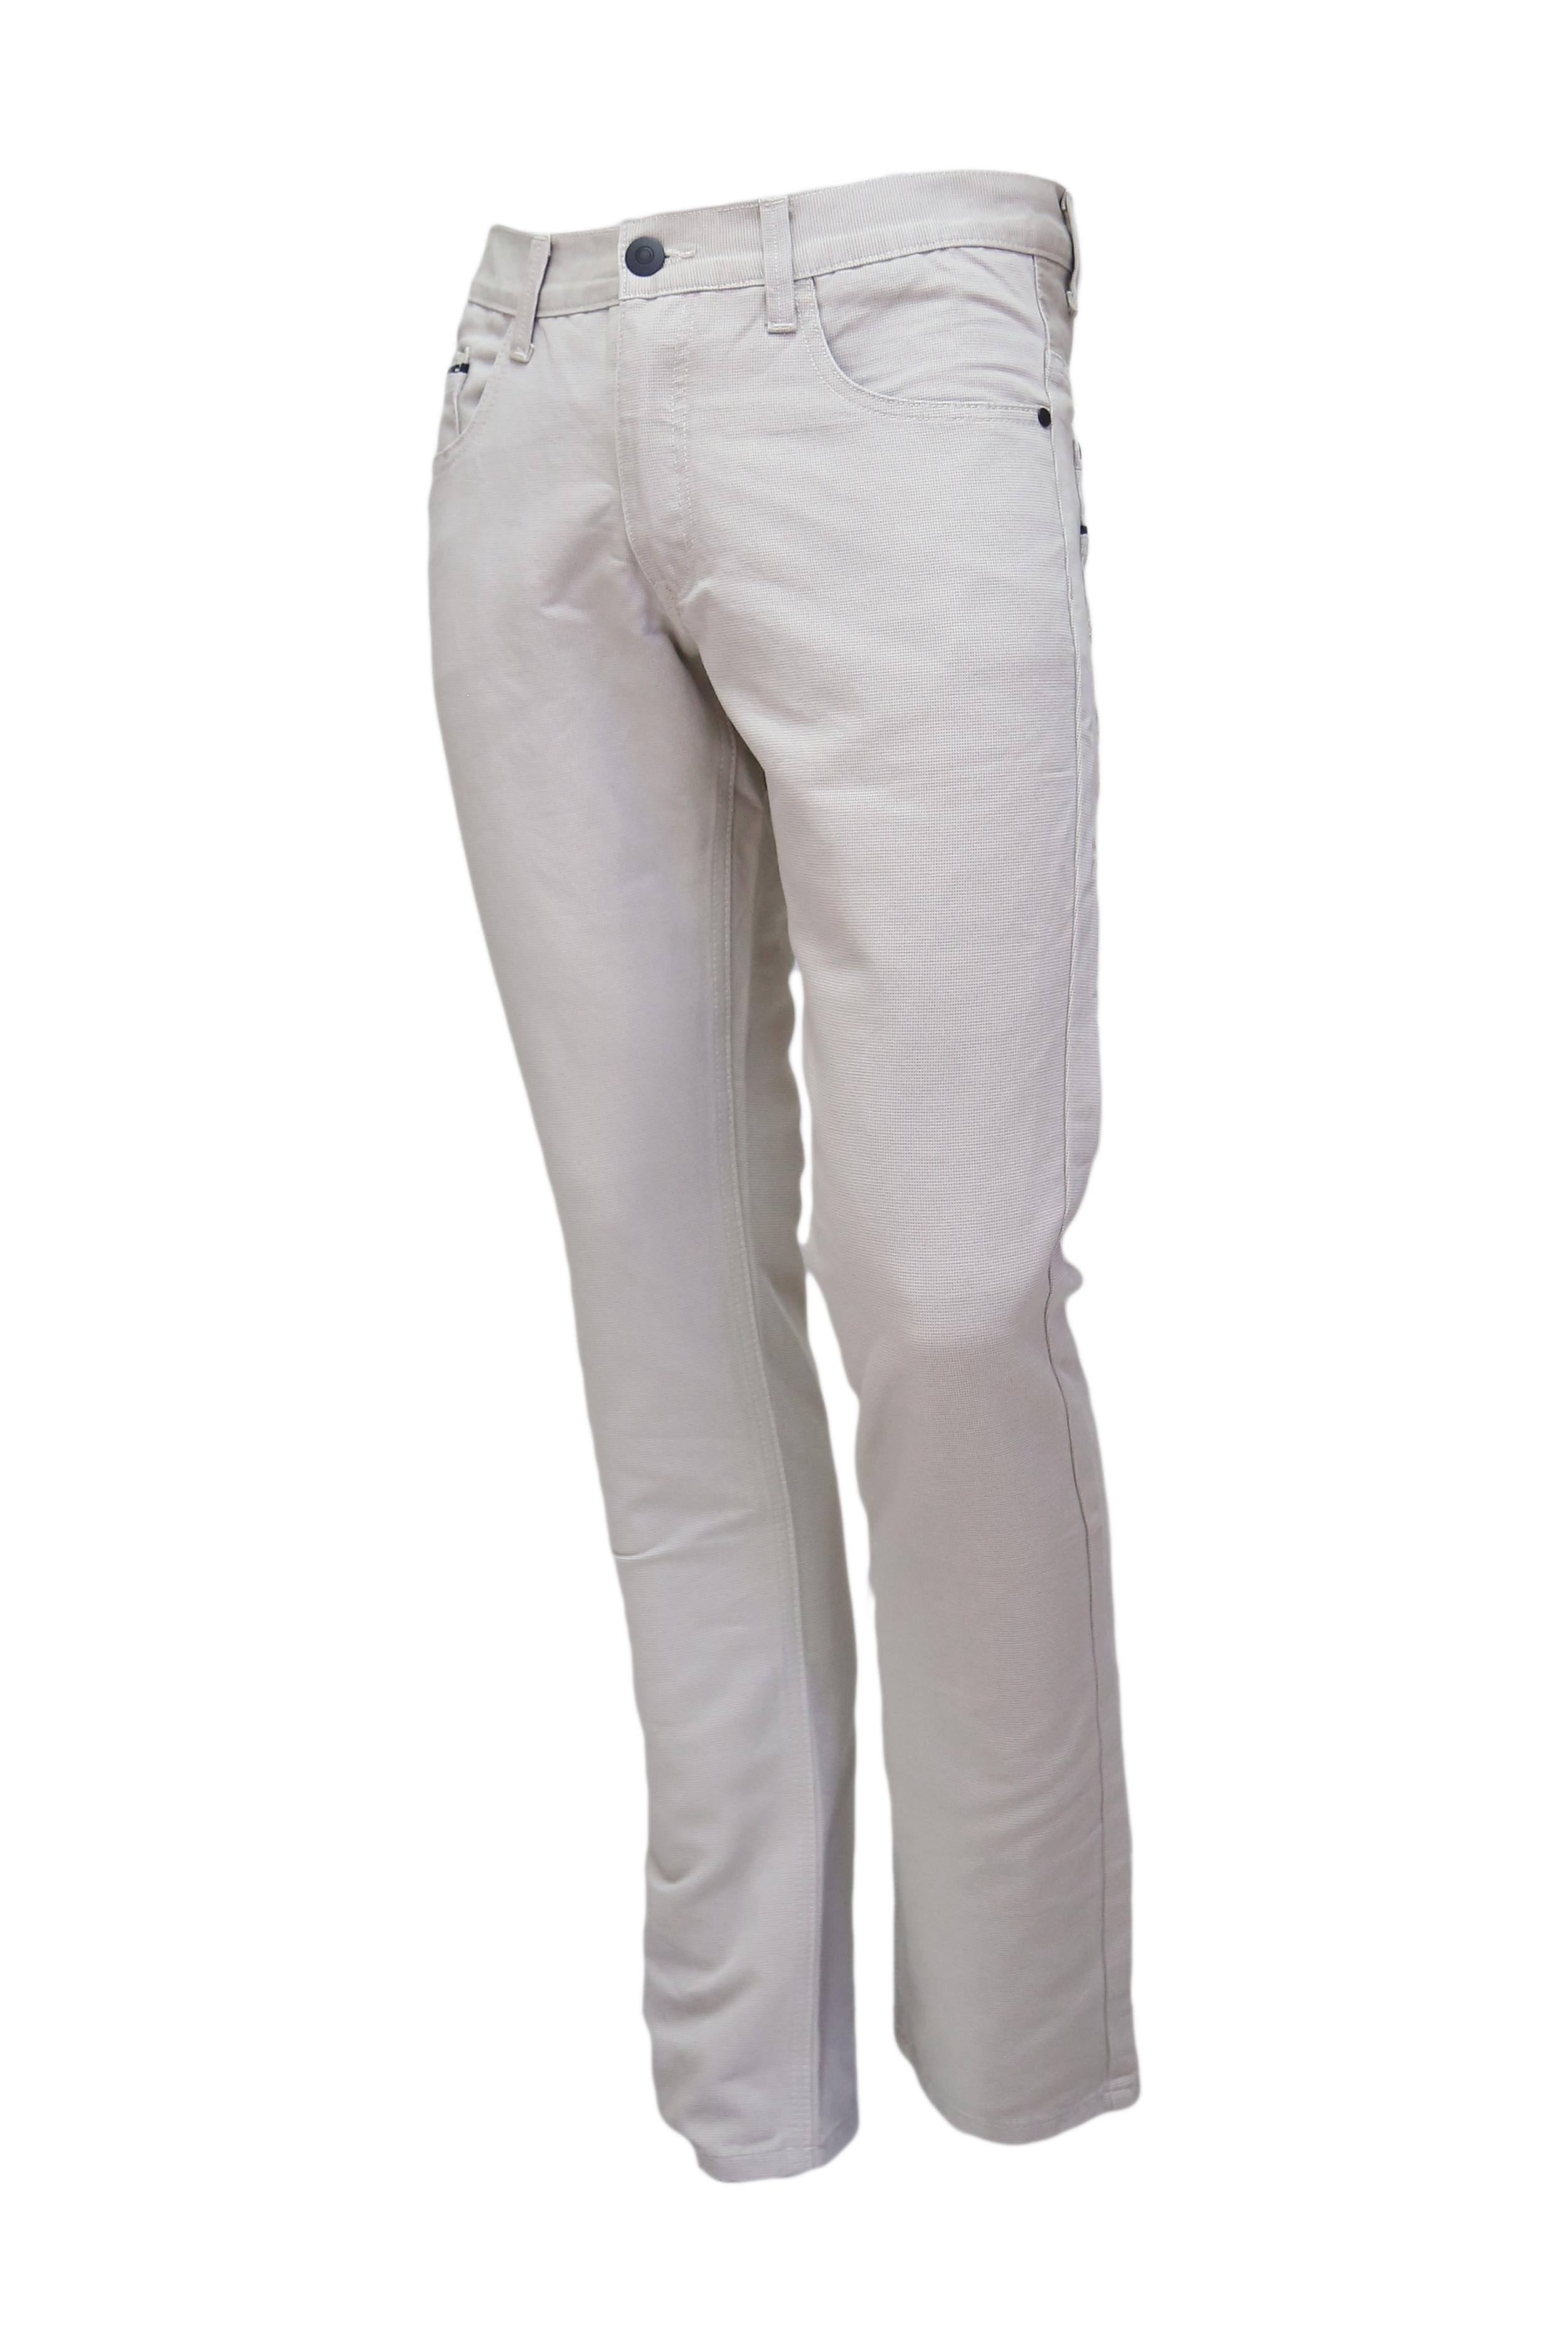 10 Pants.png